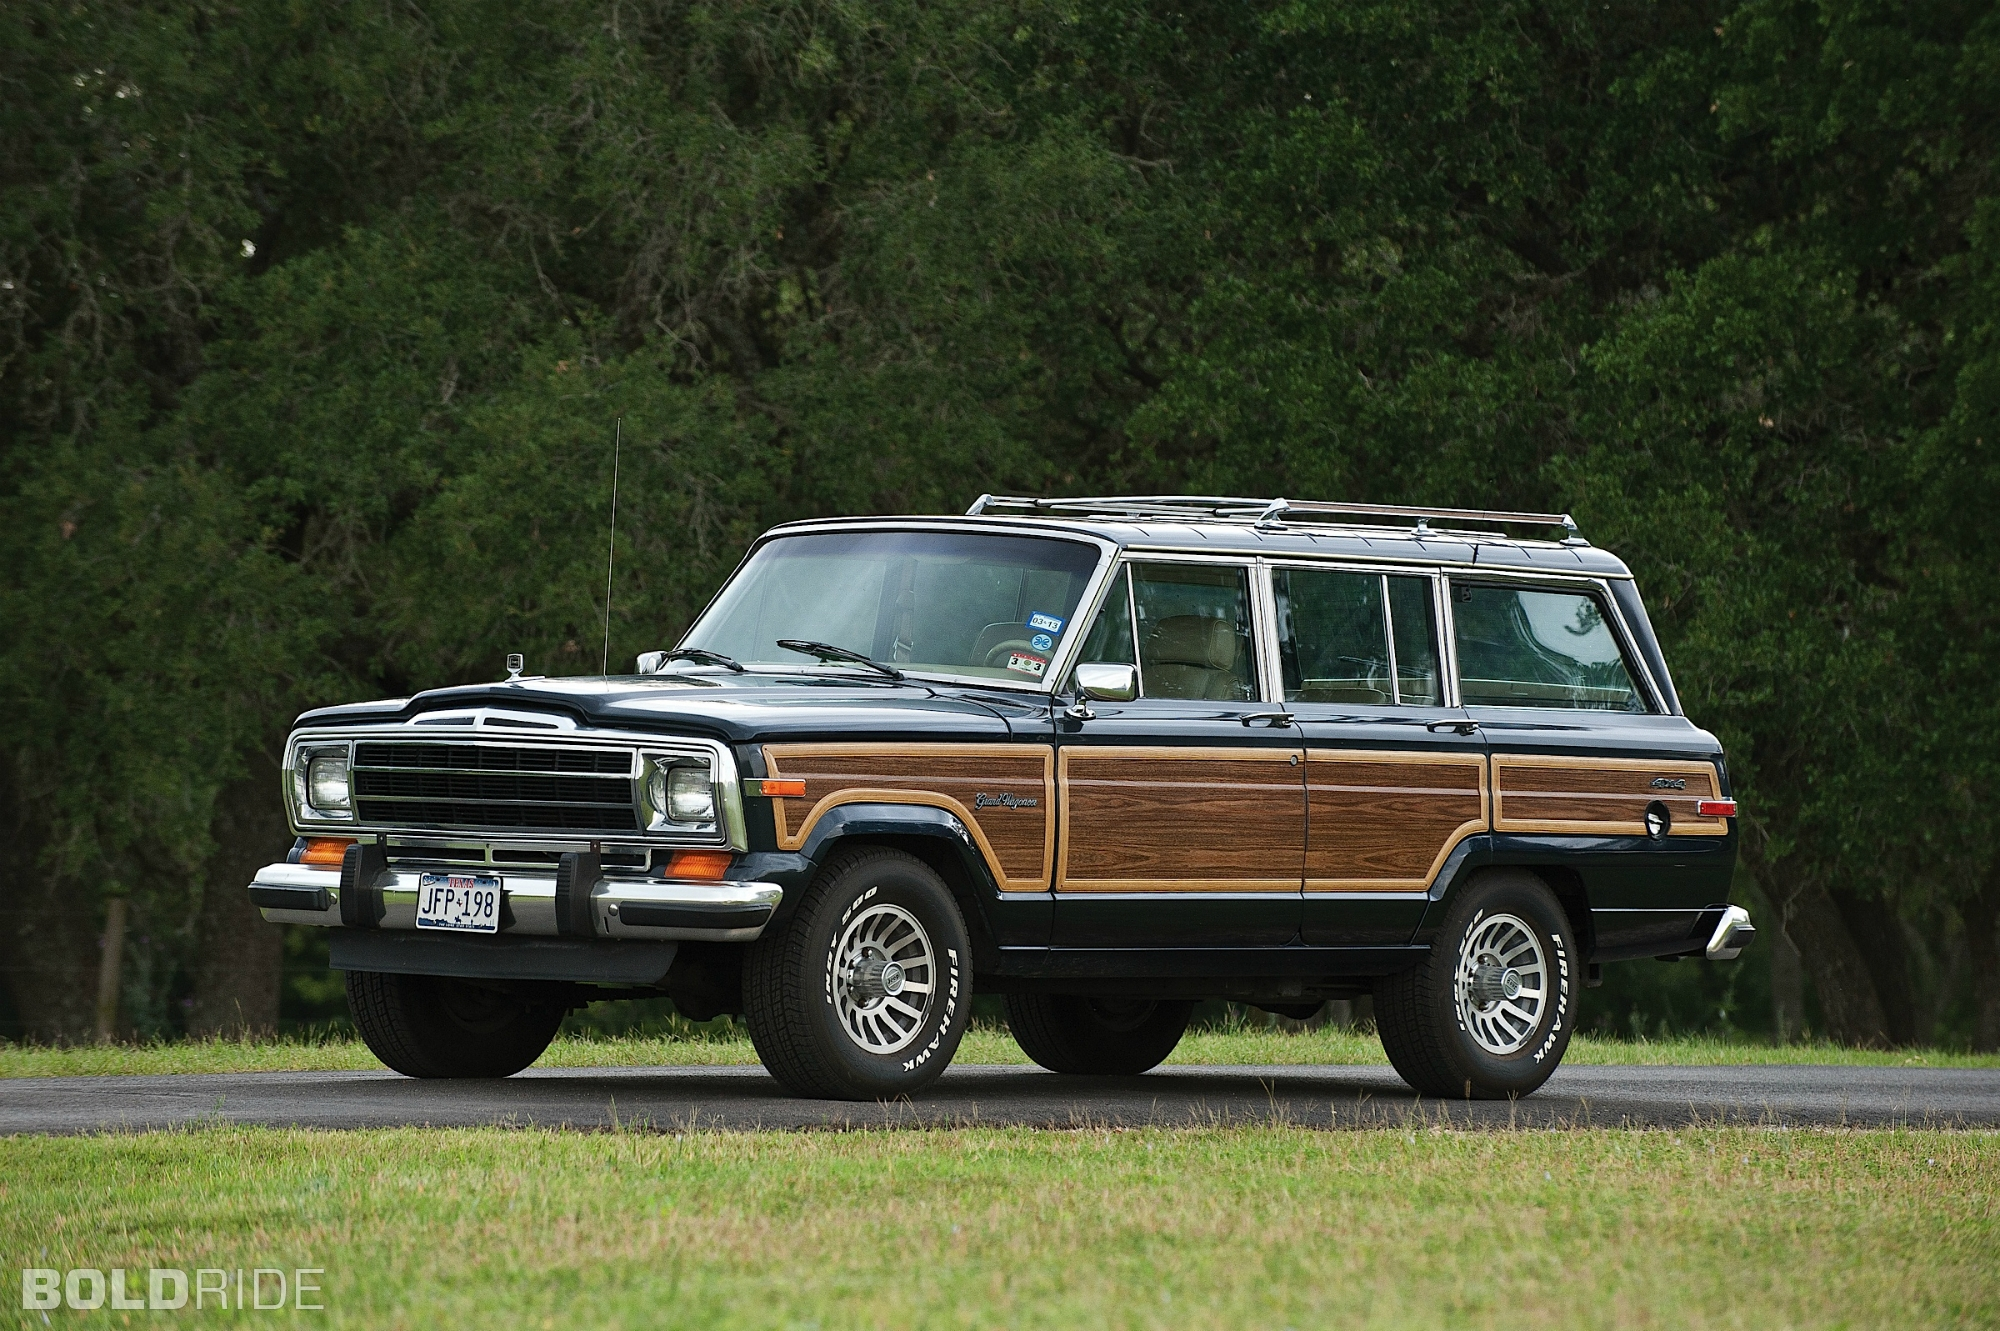 Jeep Grand Wagoneer >> 1990 JEEP GRAND WAGONEER - Image #8